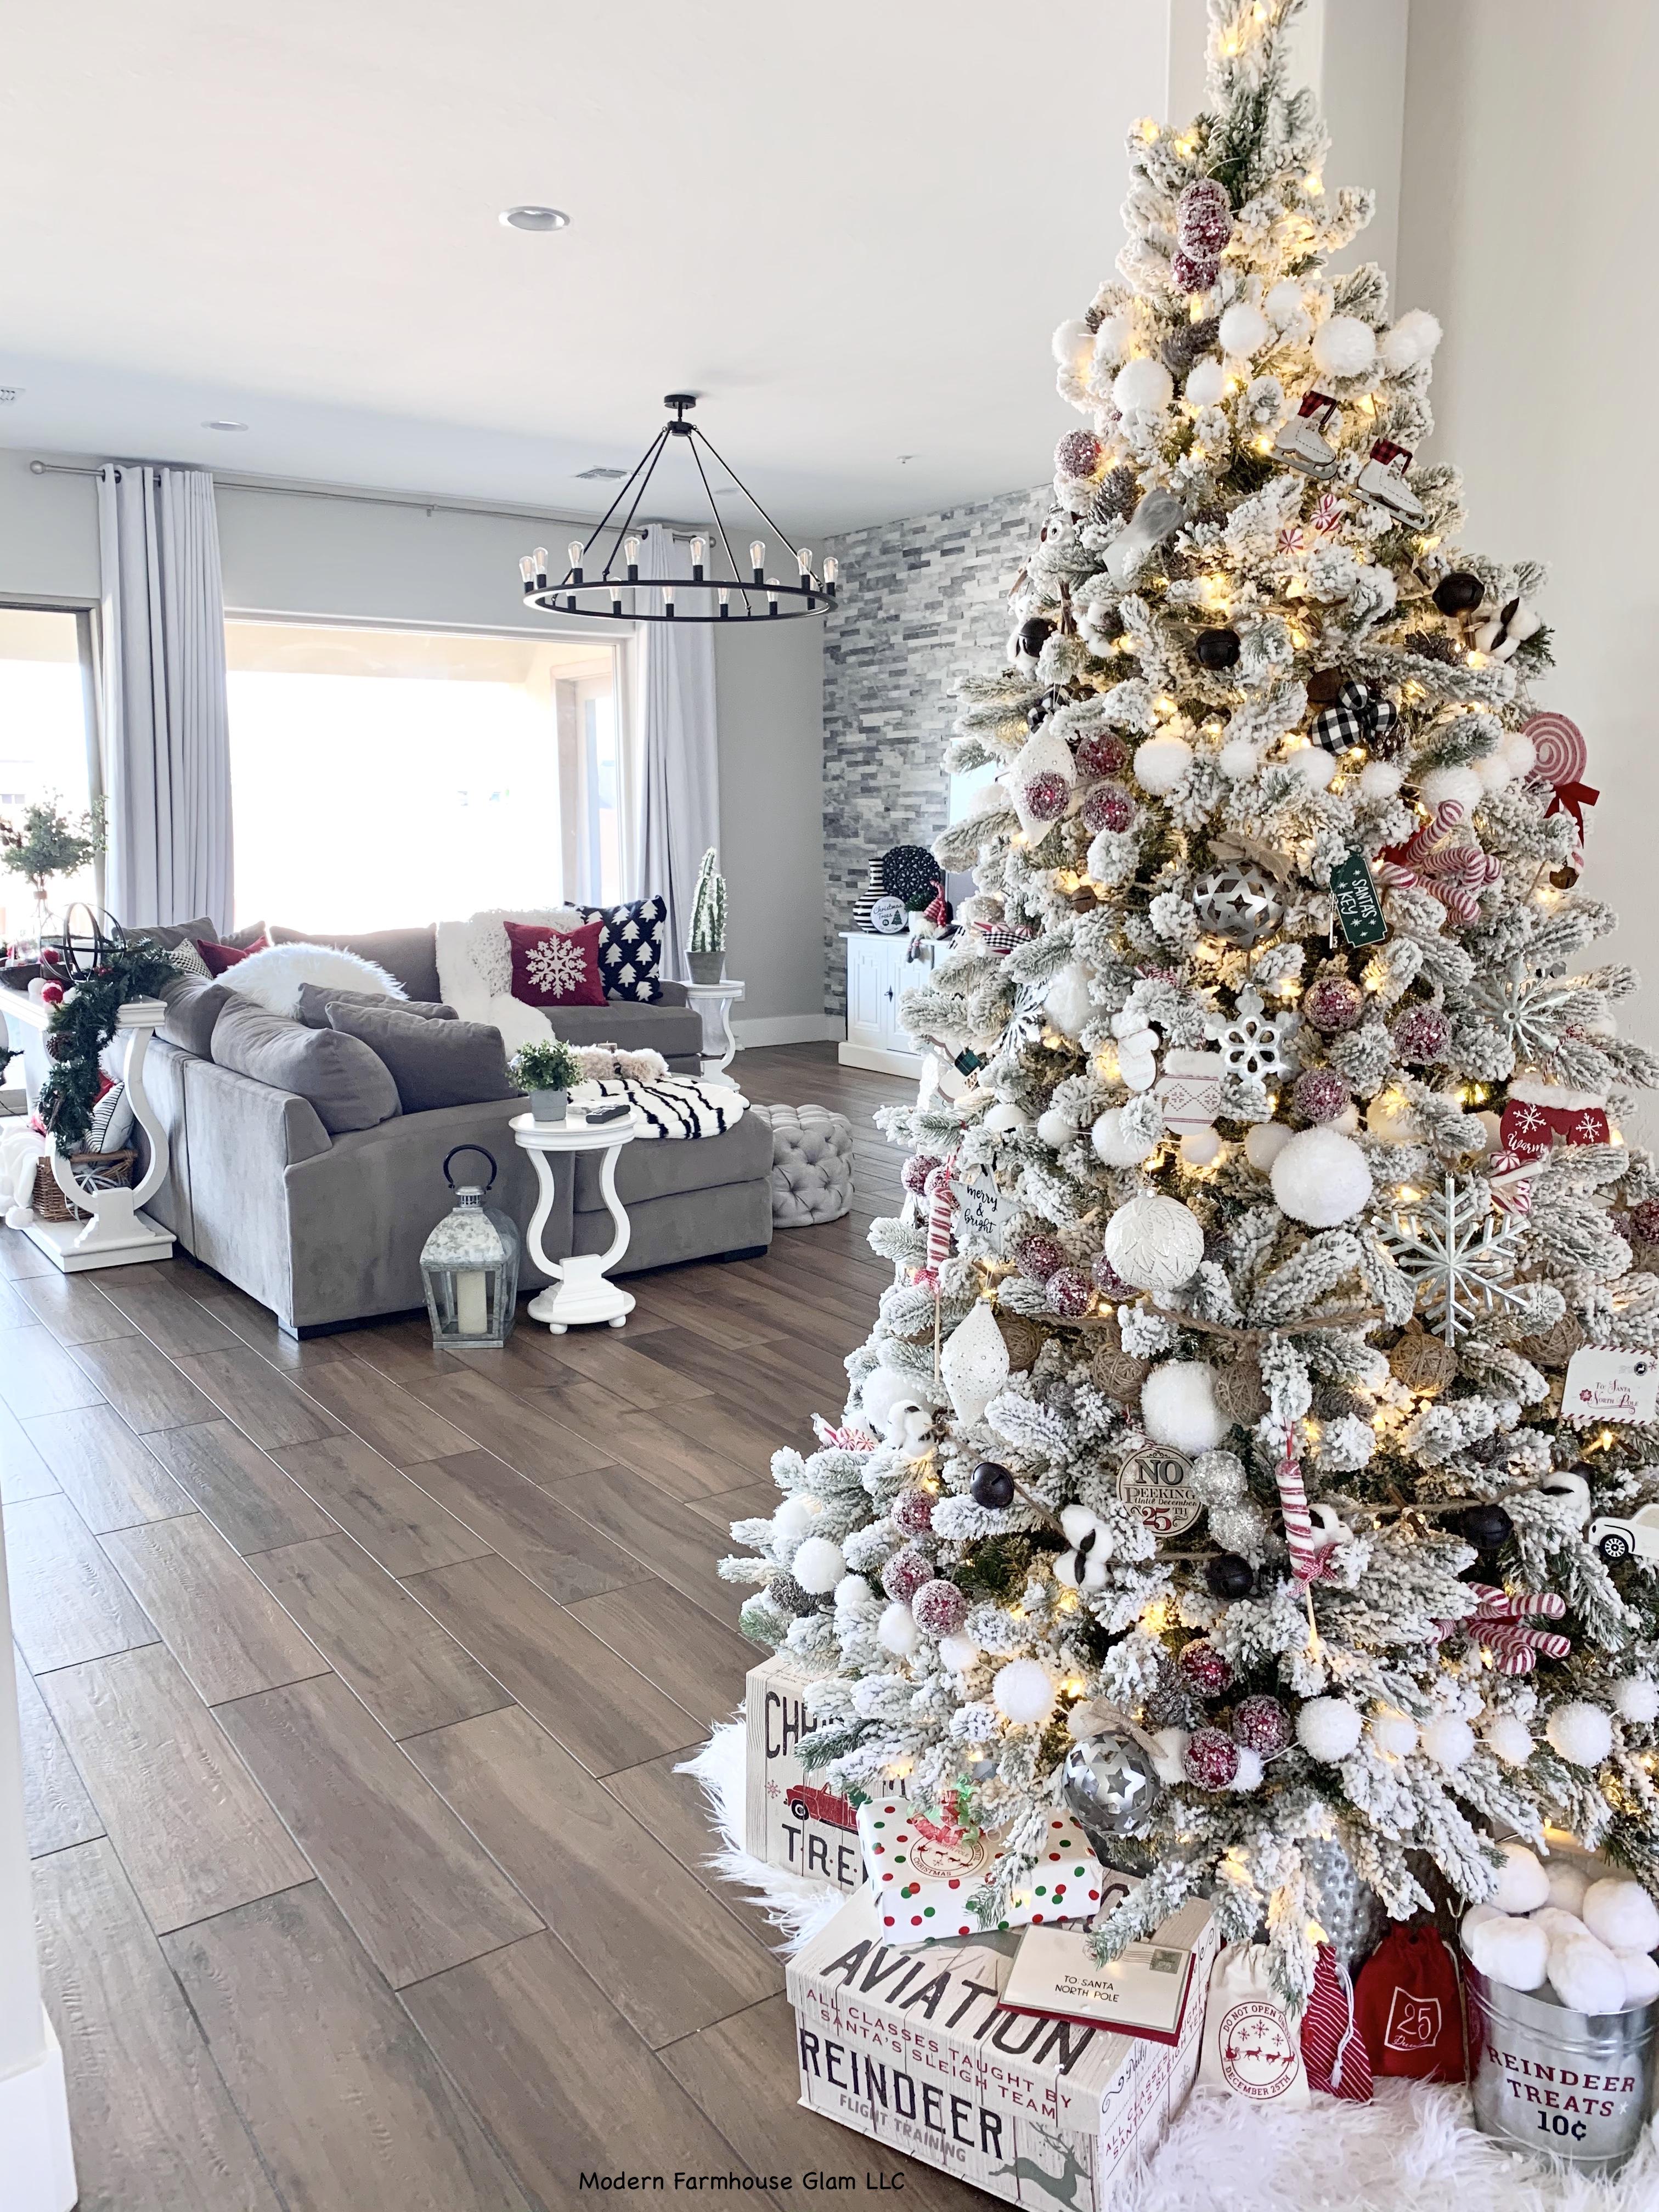 Flocked Christmas Tree, Modern Farmhouse Christmas decorations